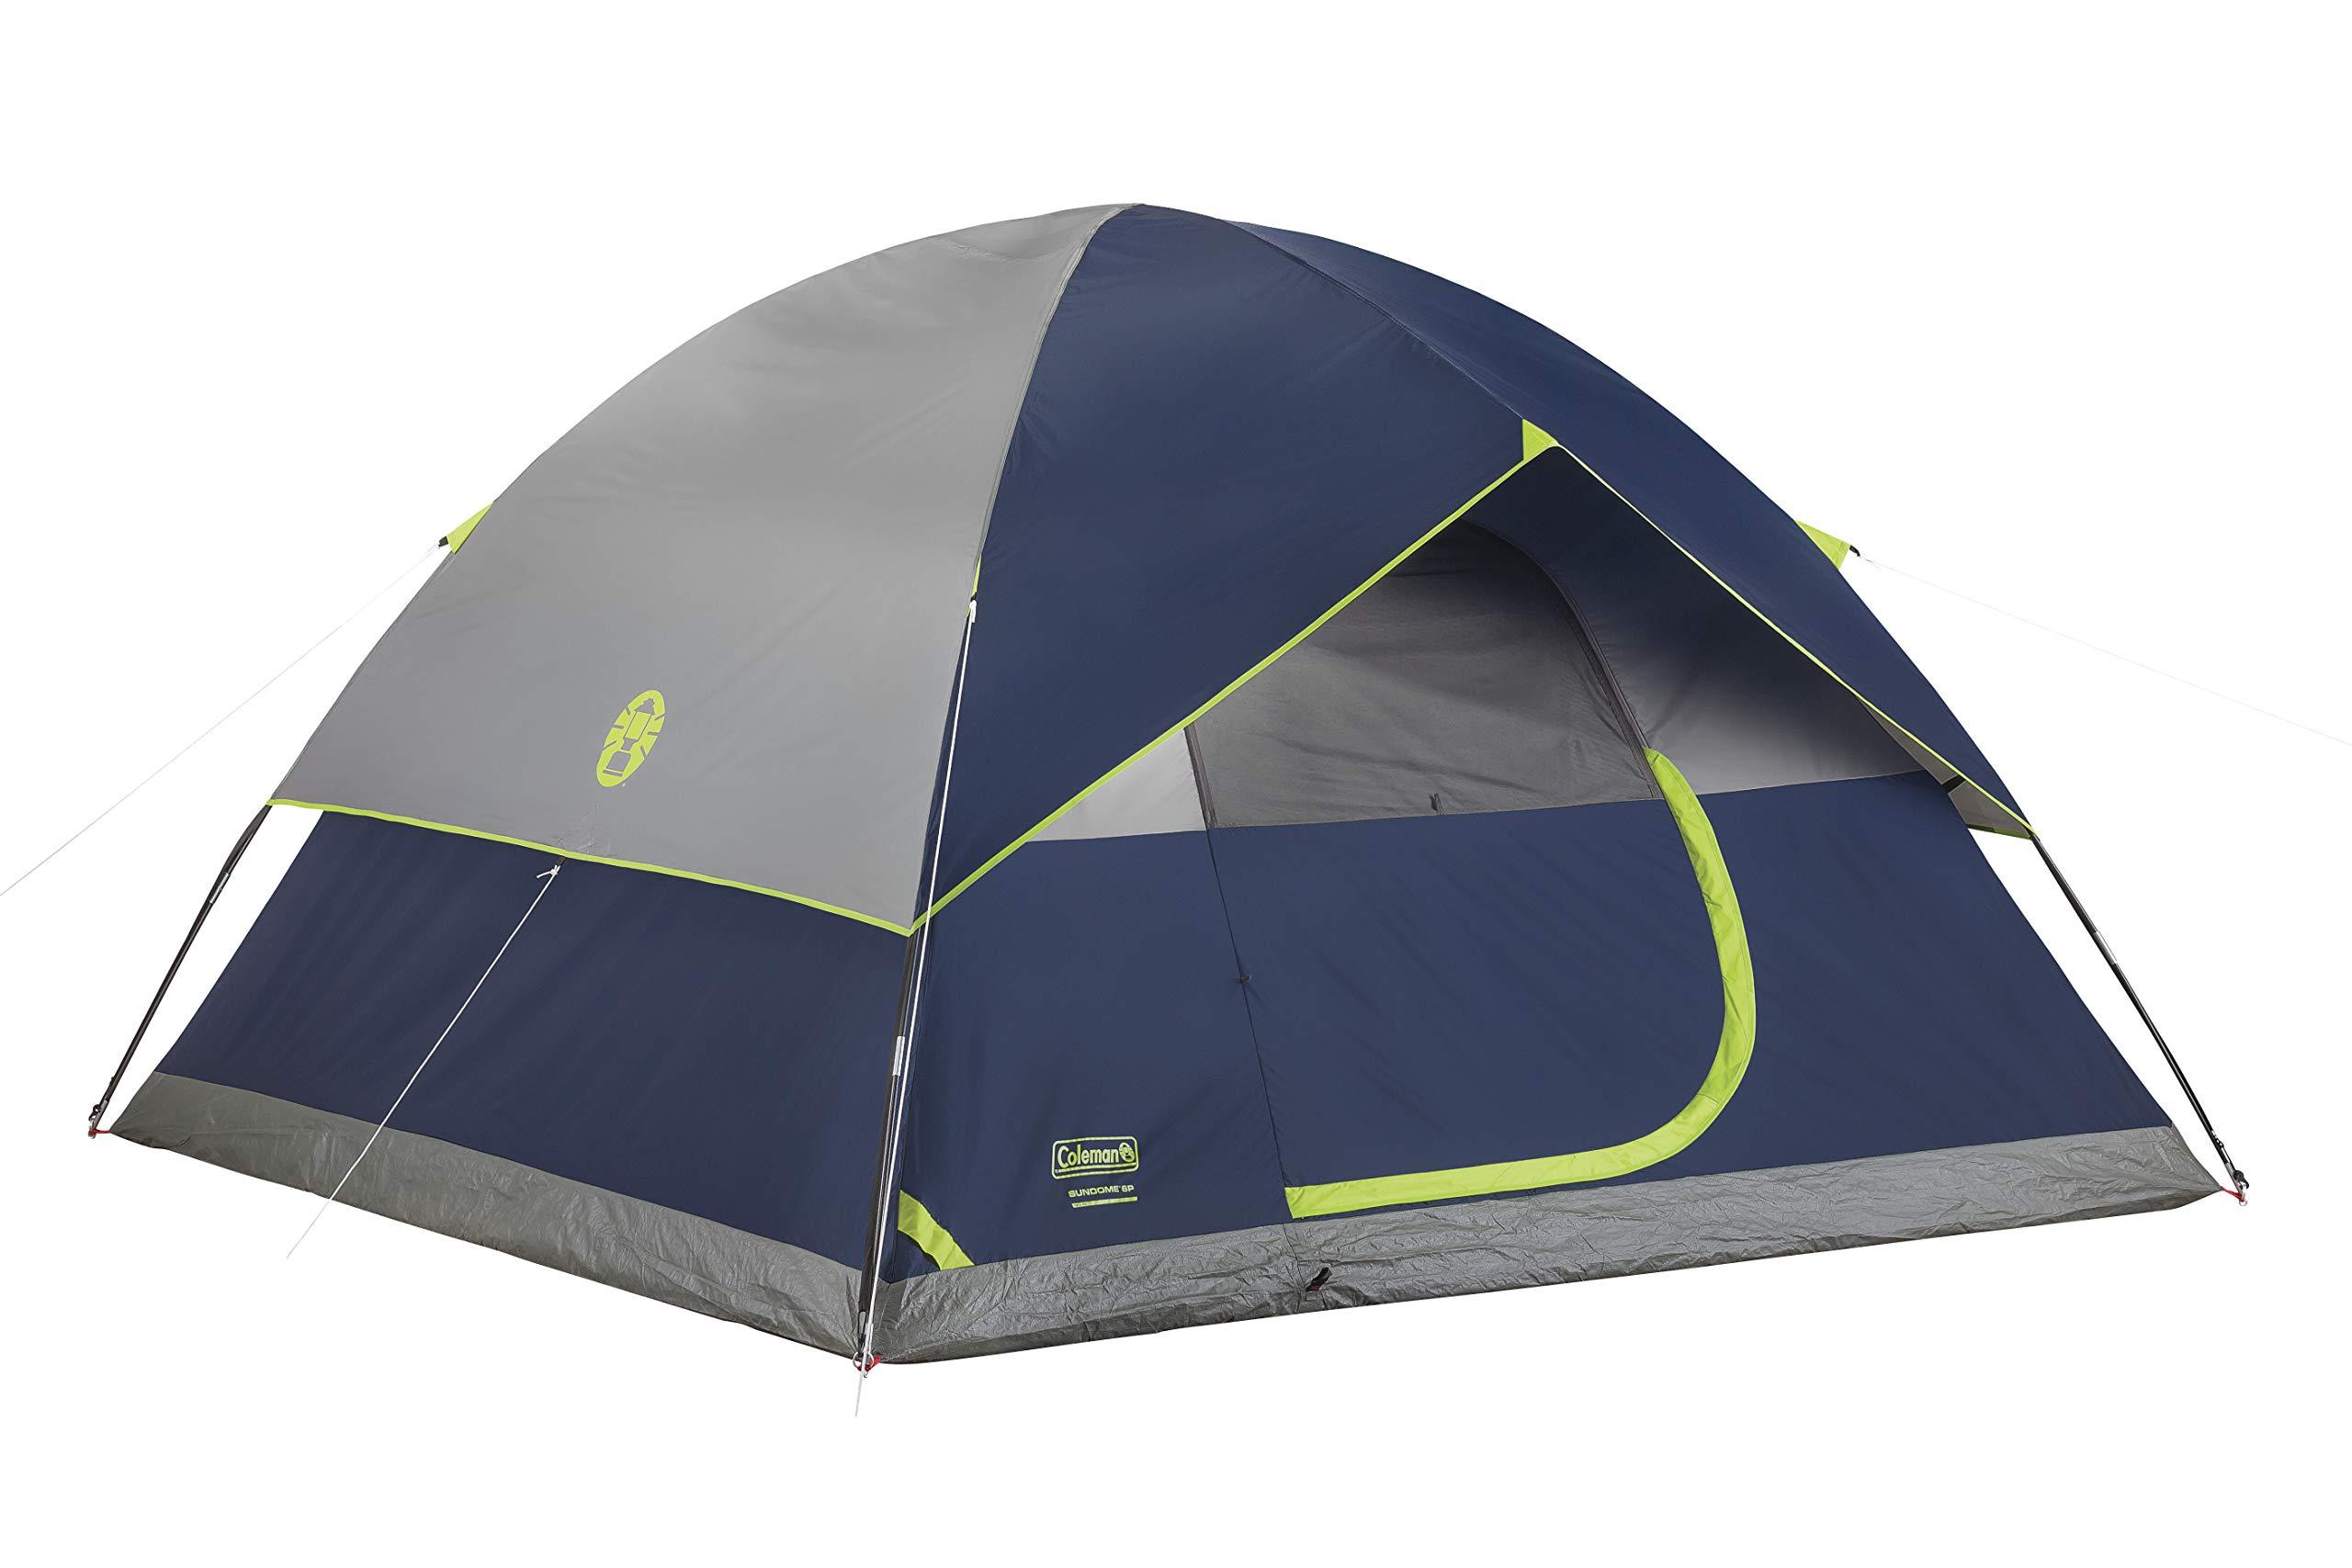 Coleman 4 Person Camping Sundome Setup